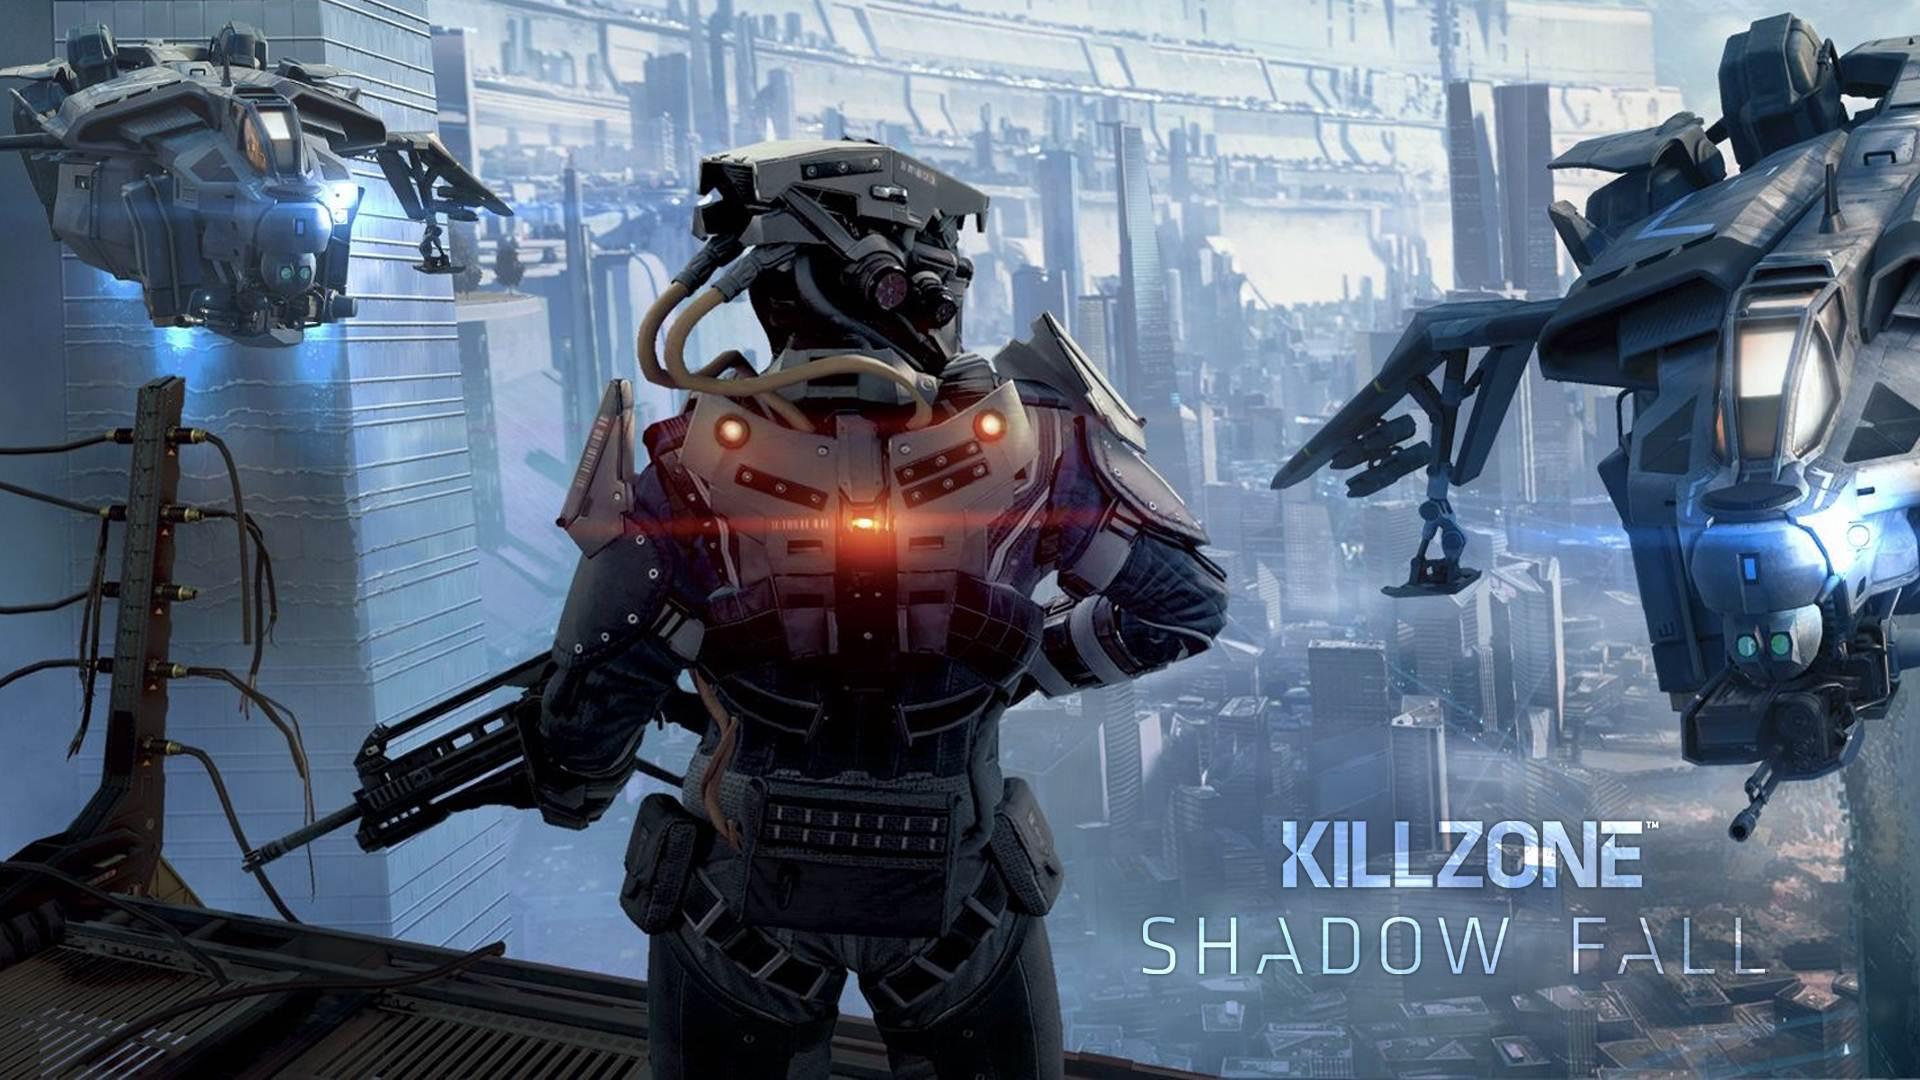 Killzone: Shadow Fall supera i 2,1 milioni di copie vendute